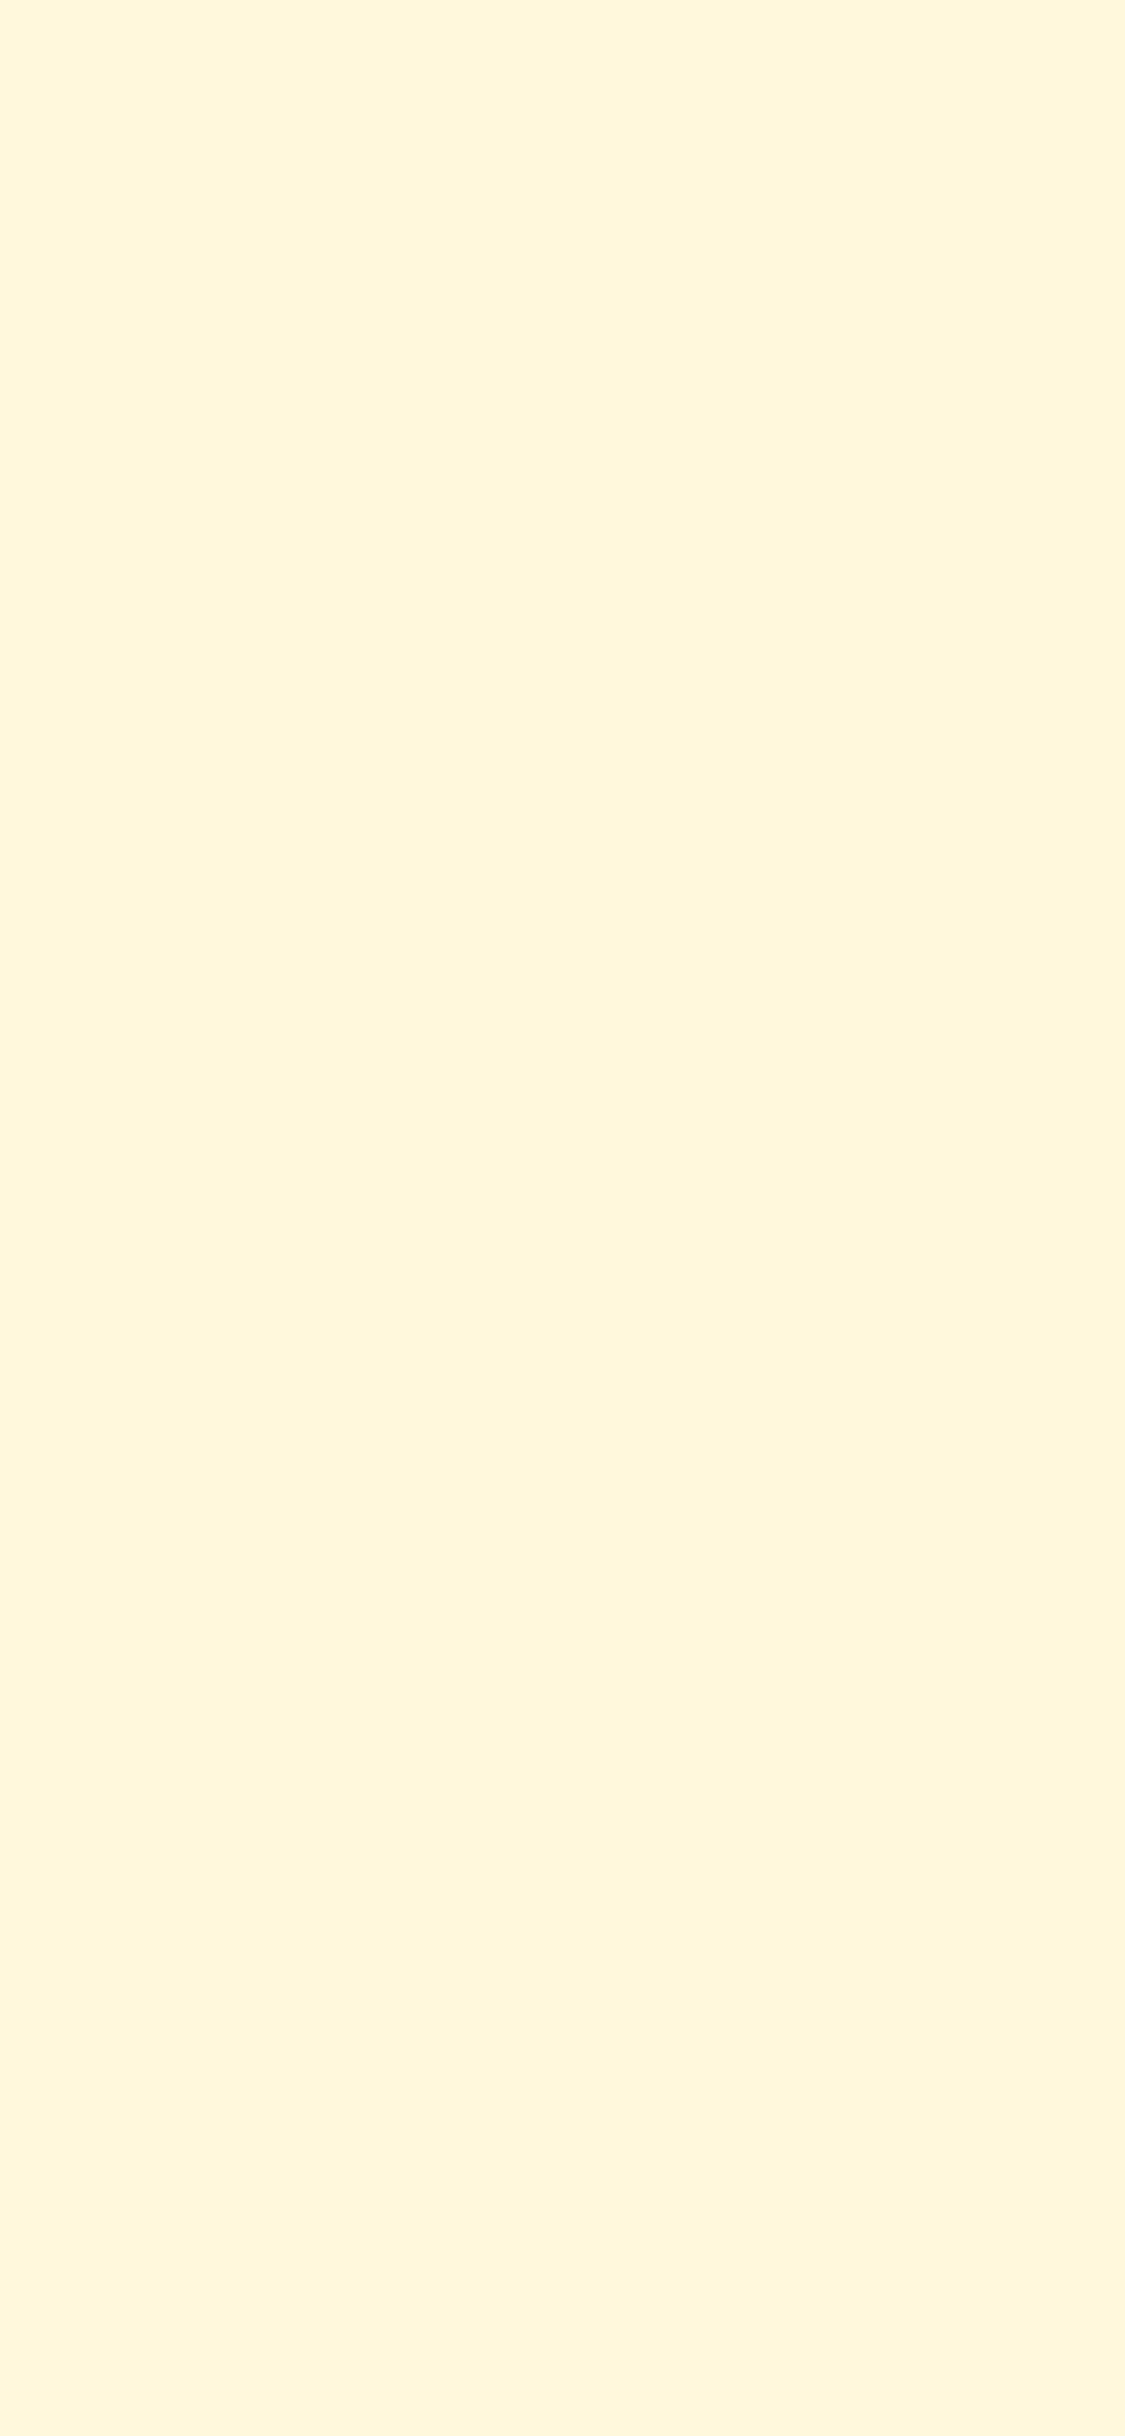 1125x2436 Cornsilk Solid Color Background